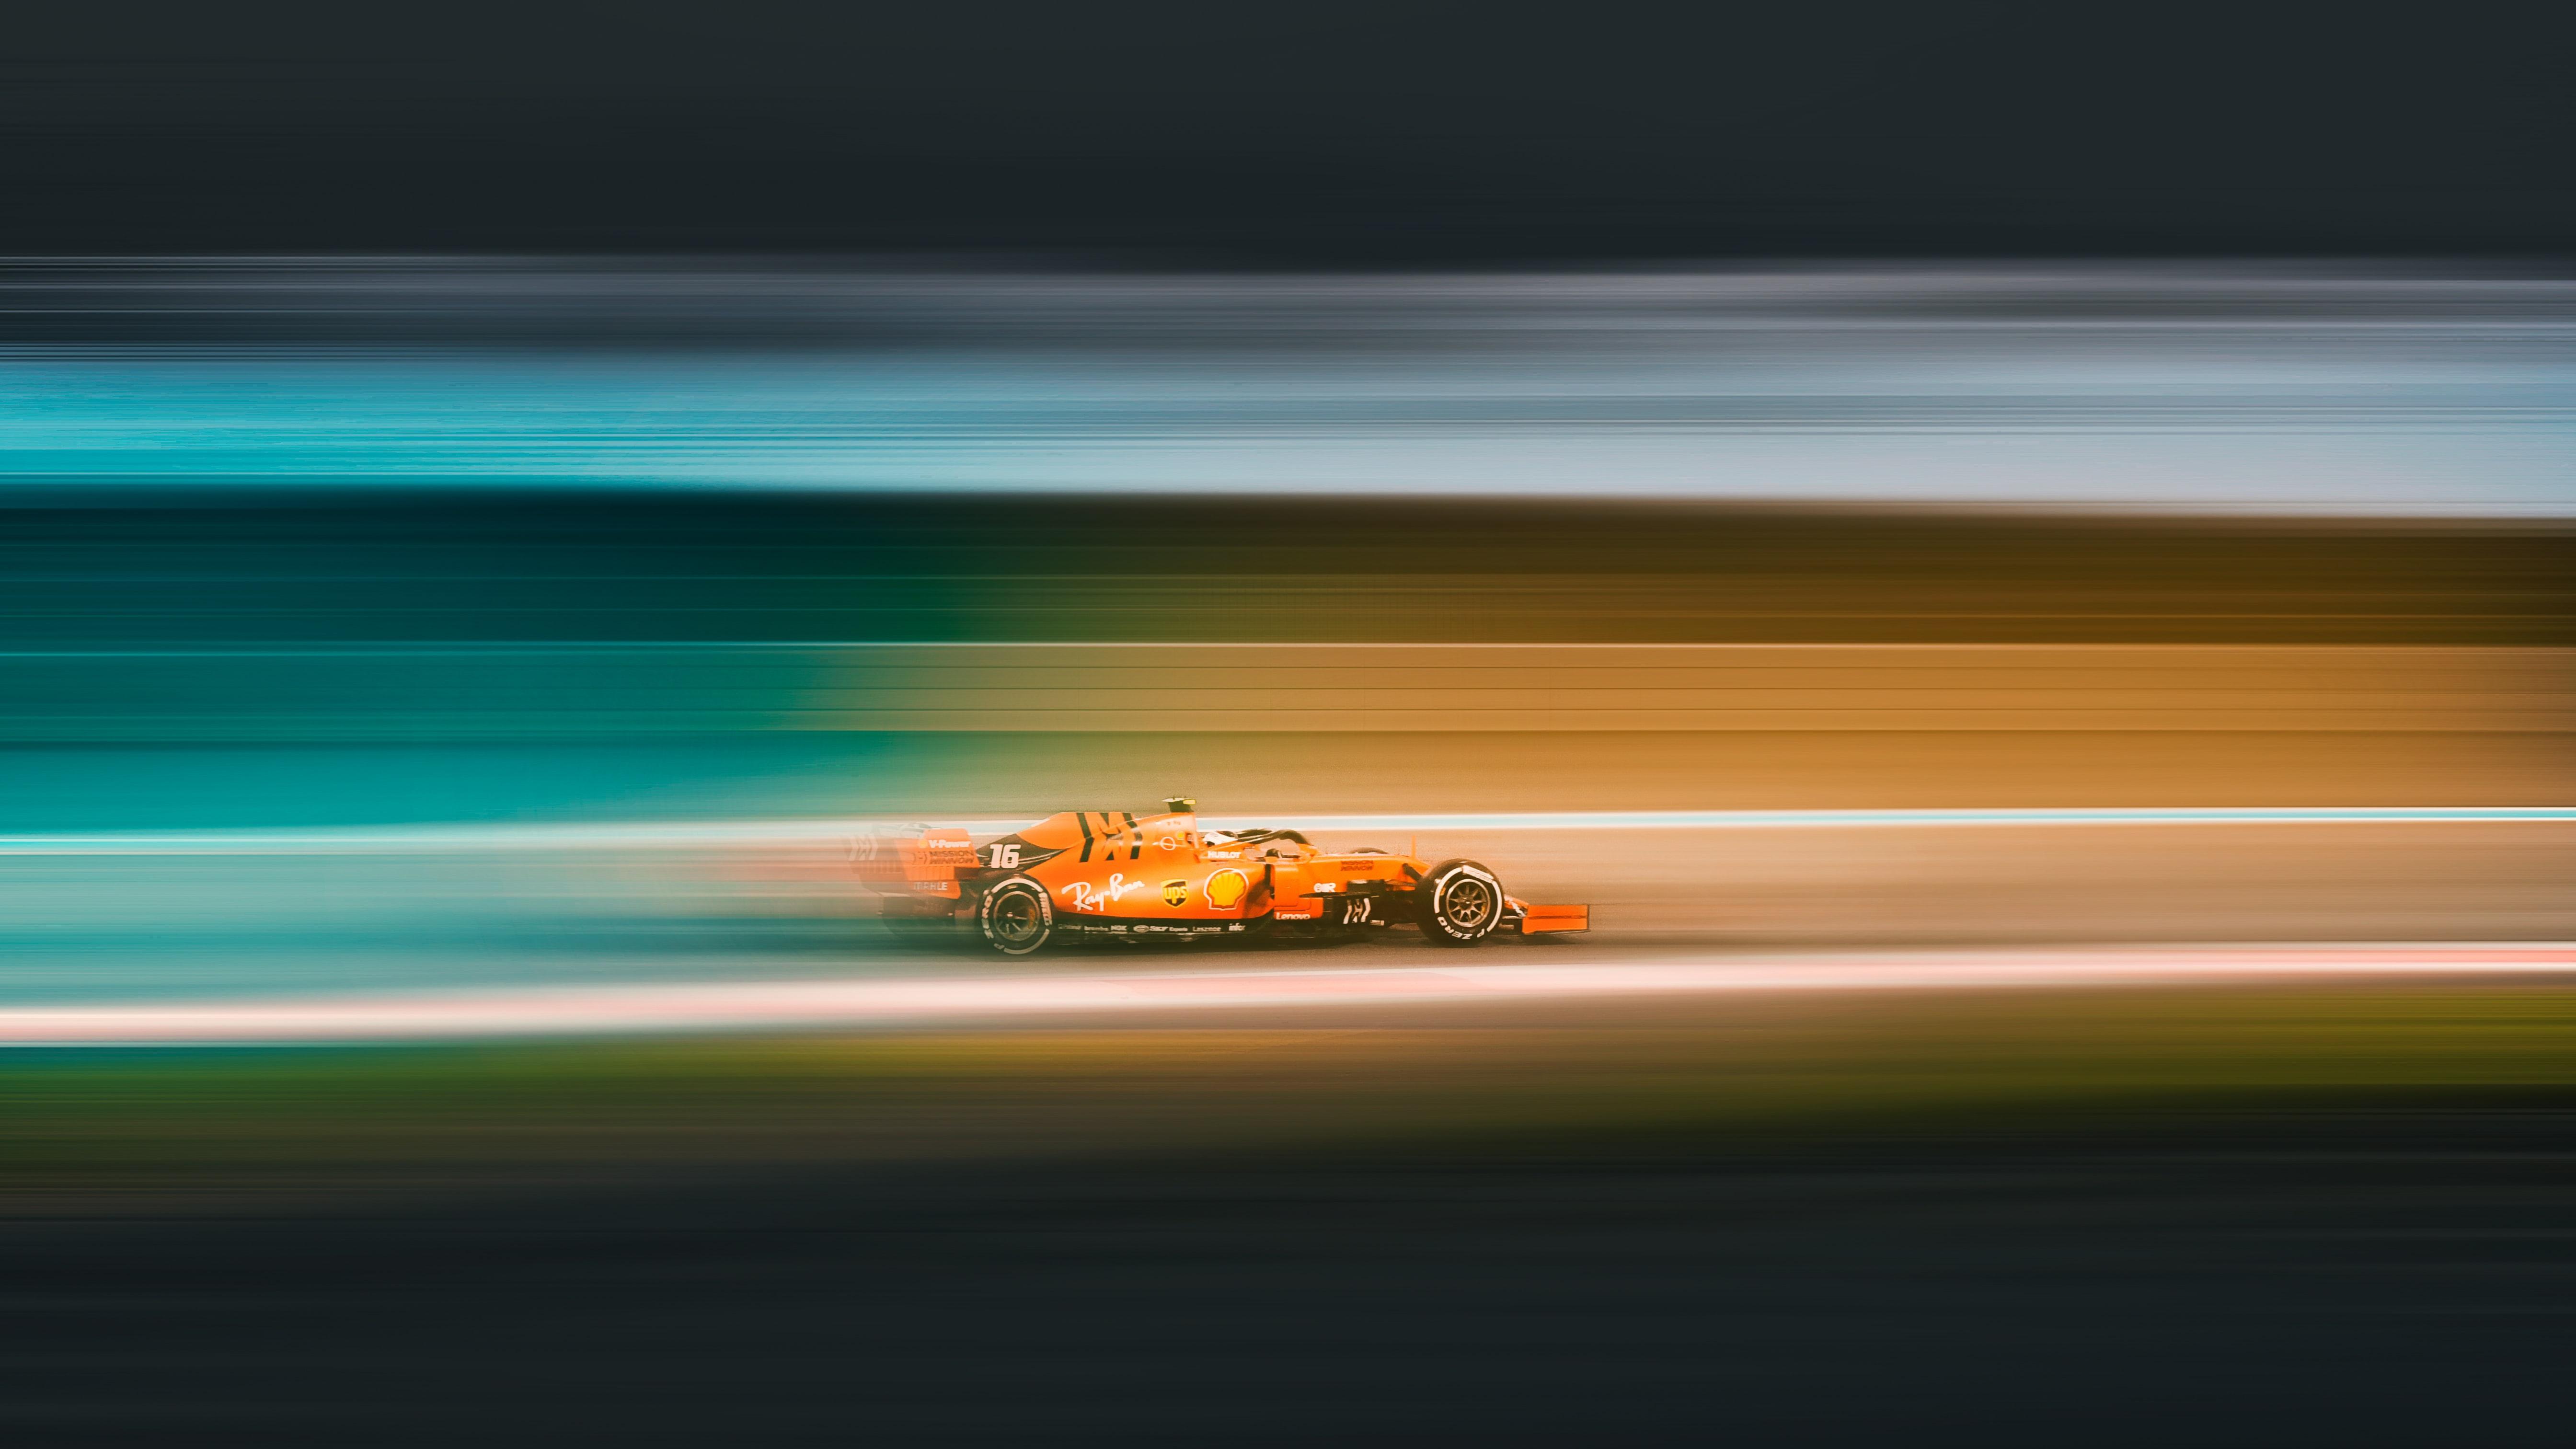 What the Monaco Grand Prix Can Teach FEC's About Attraction Design